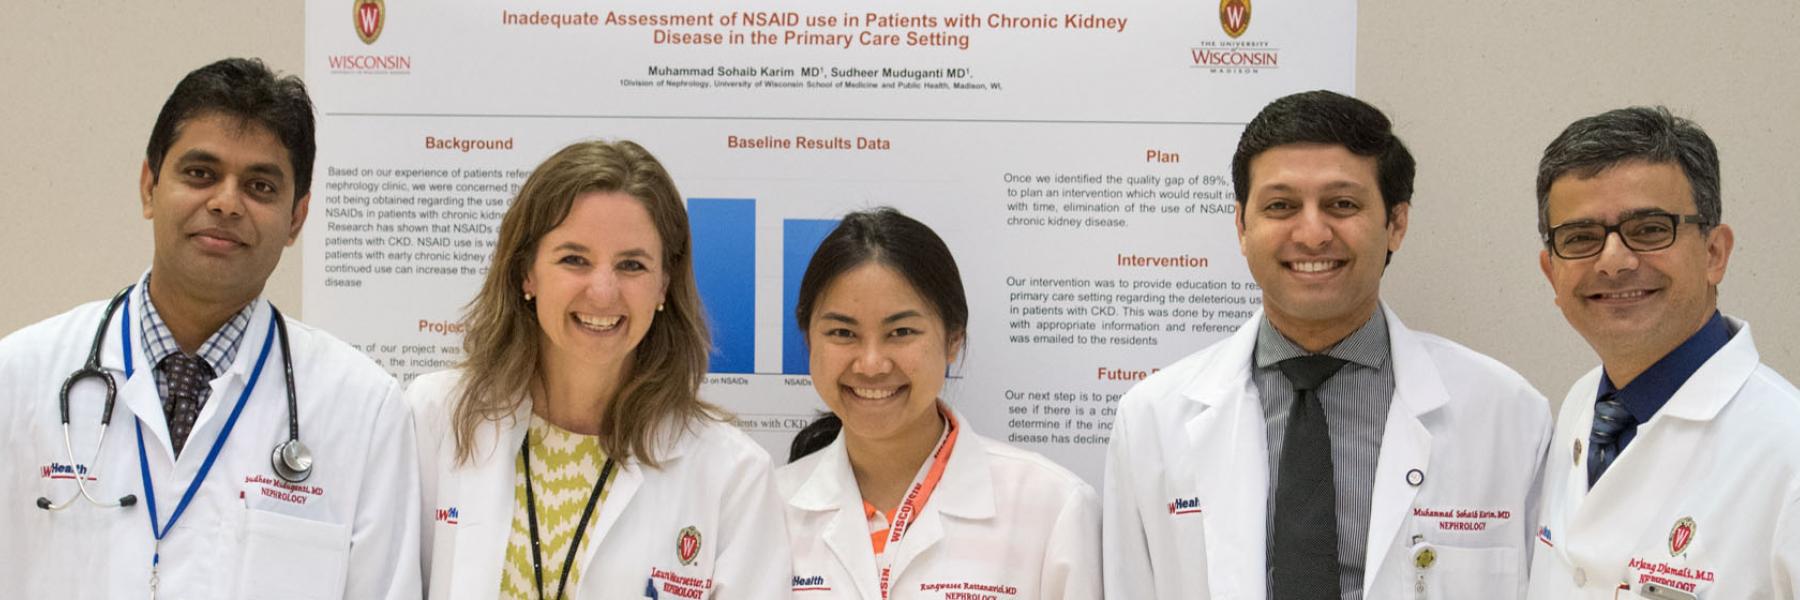 How to Apply to the Nephrology Fellowship Program